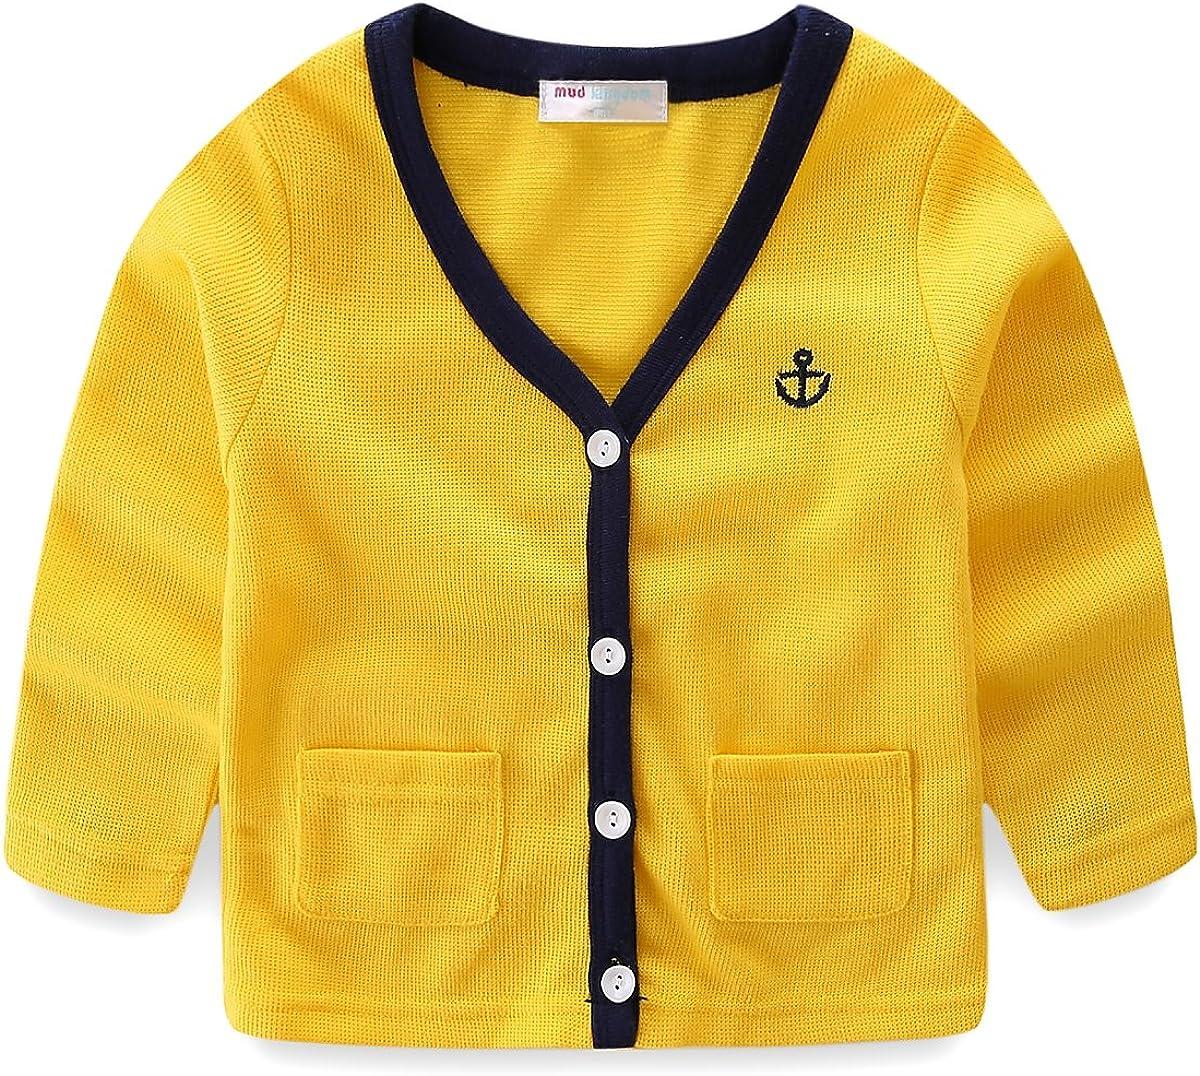 Mud Kingdom Little Boys Cute Cardigan Jacket Embroidered Casual